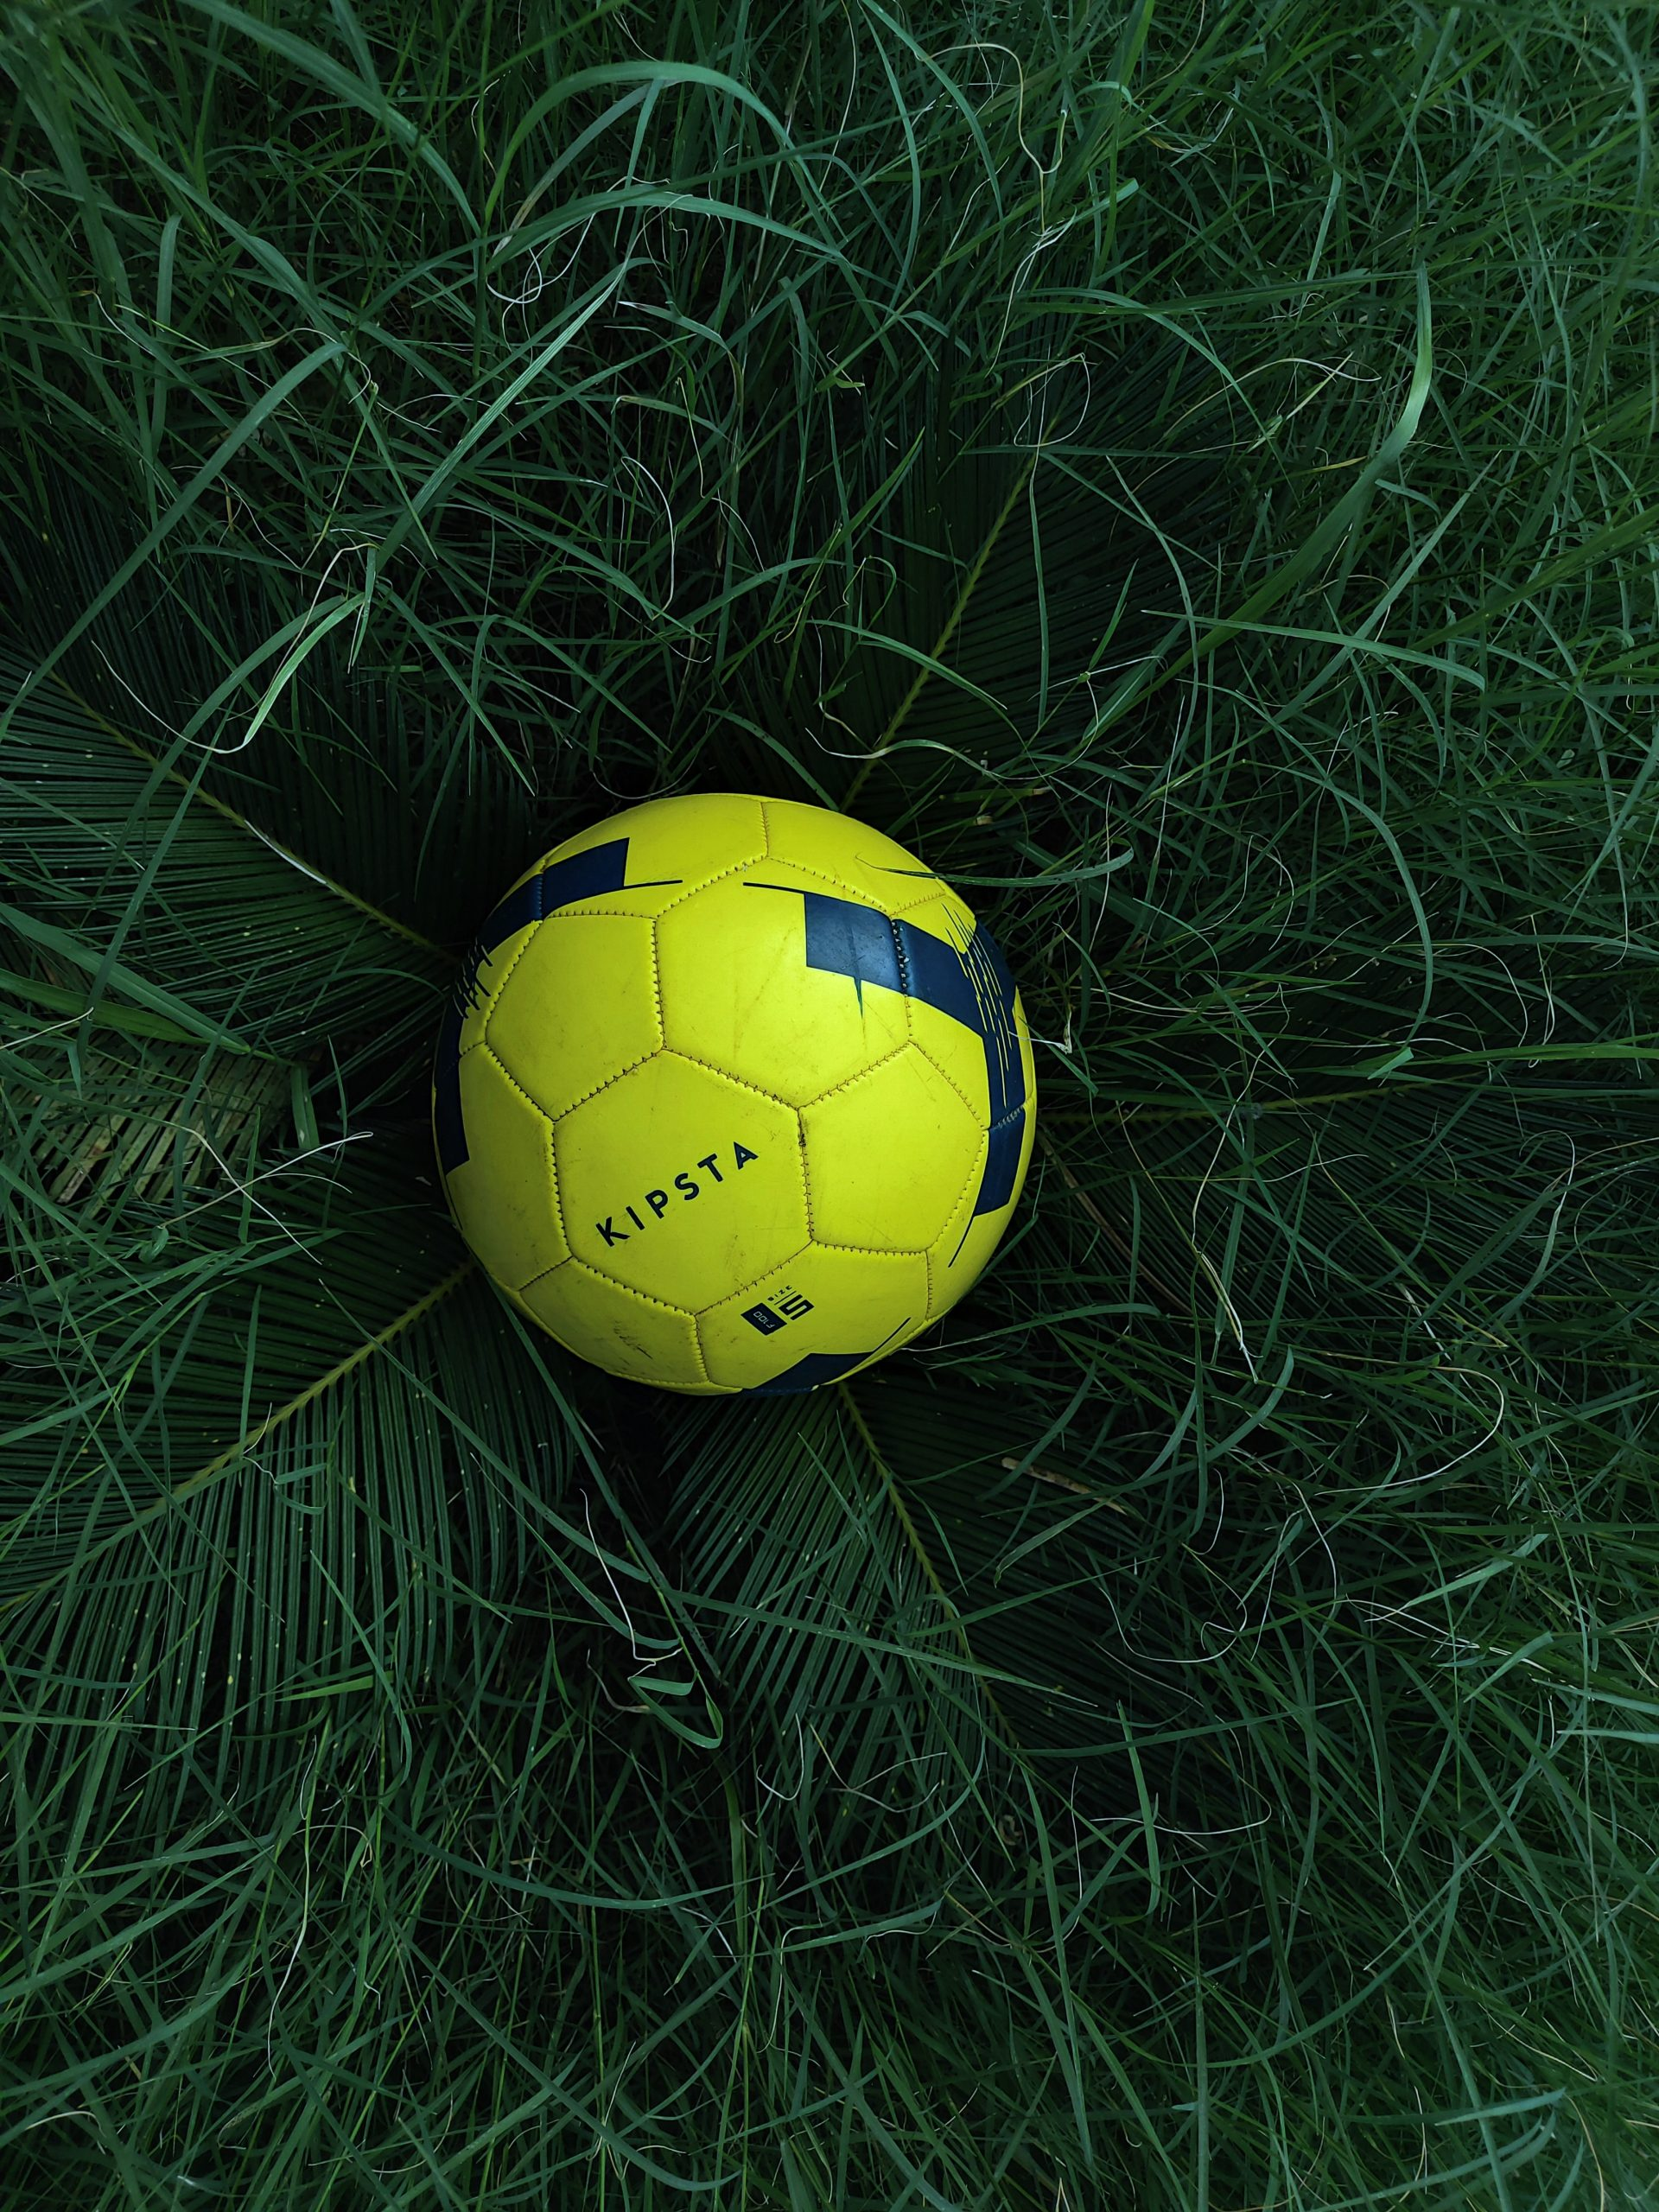 Lost Football